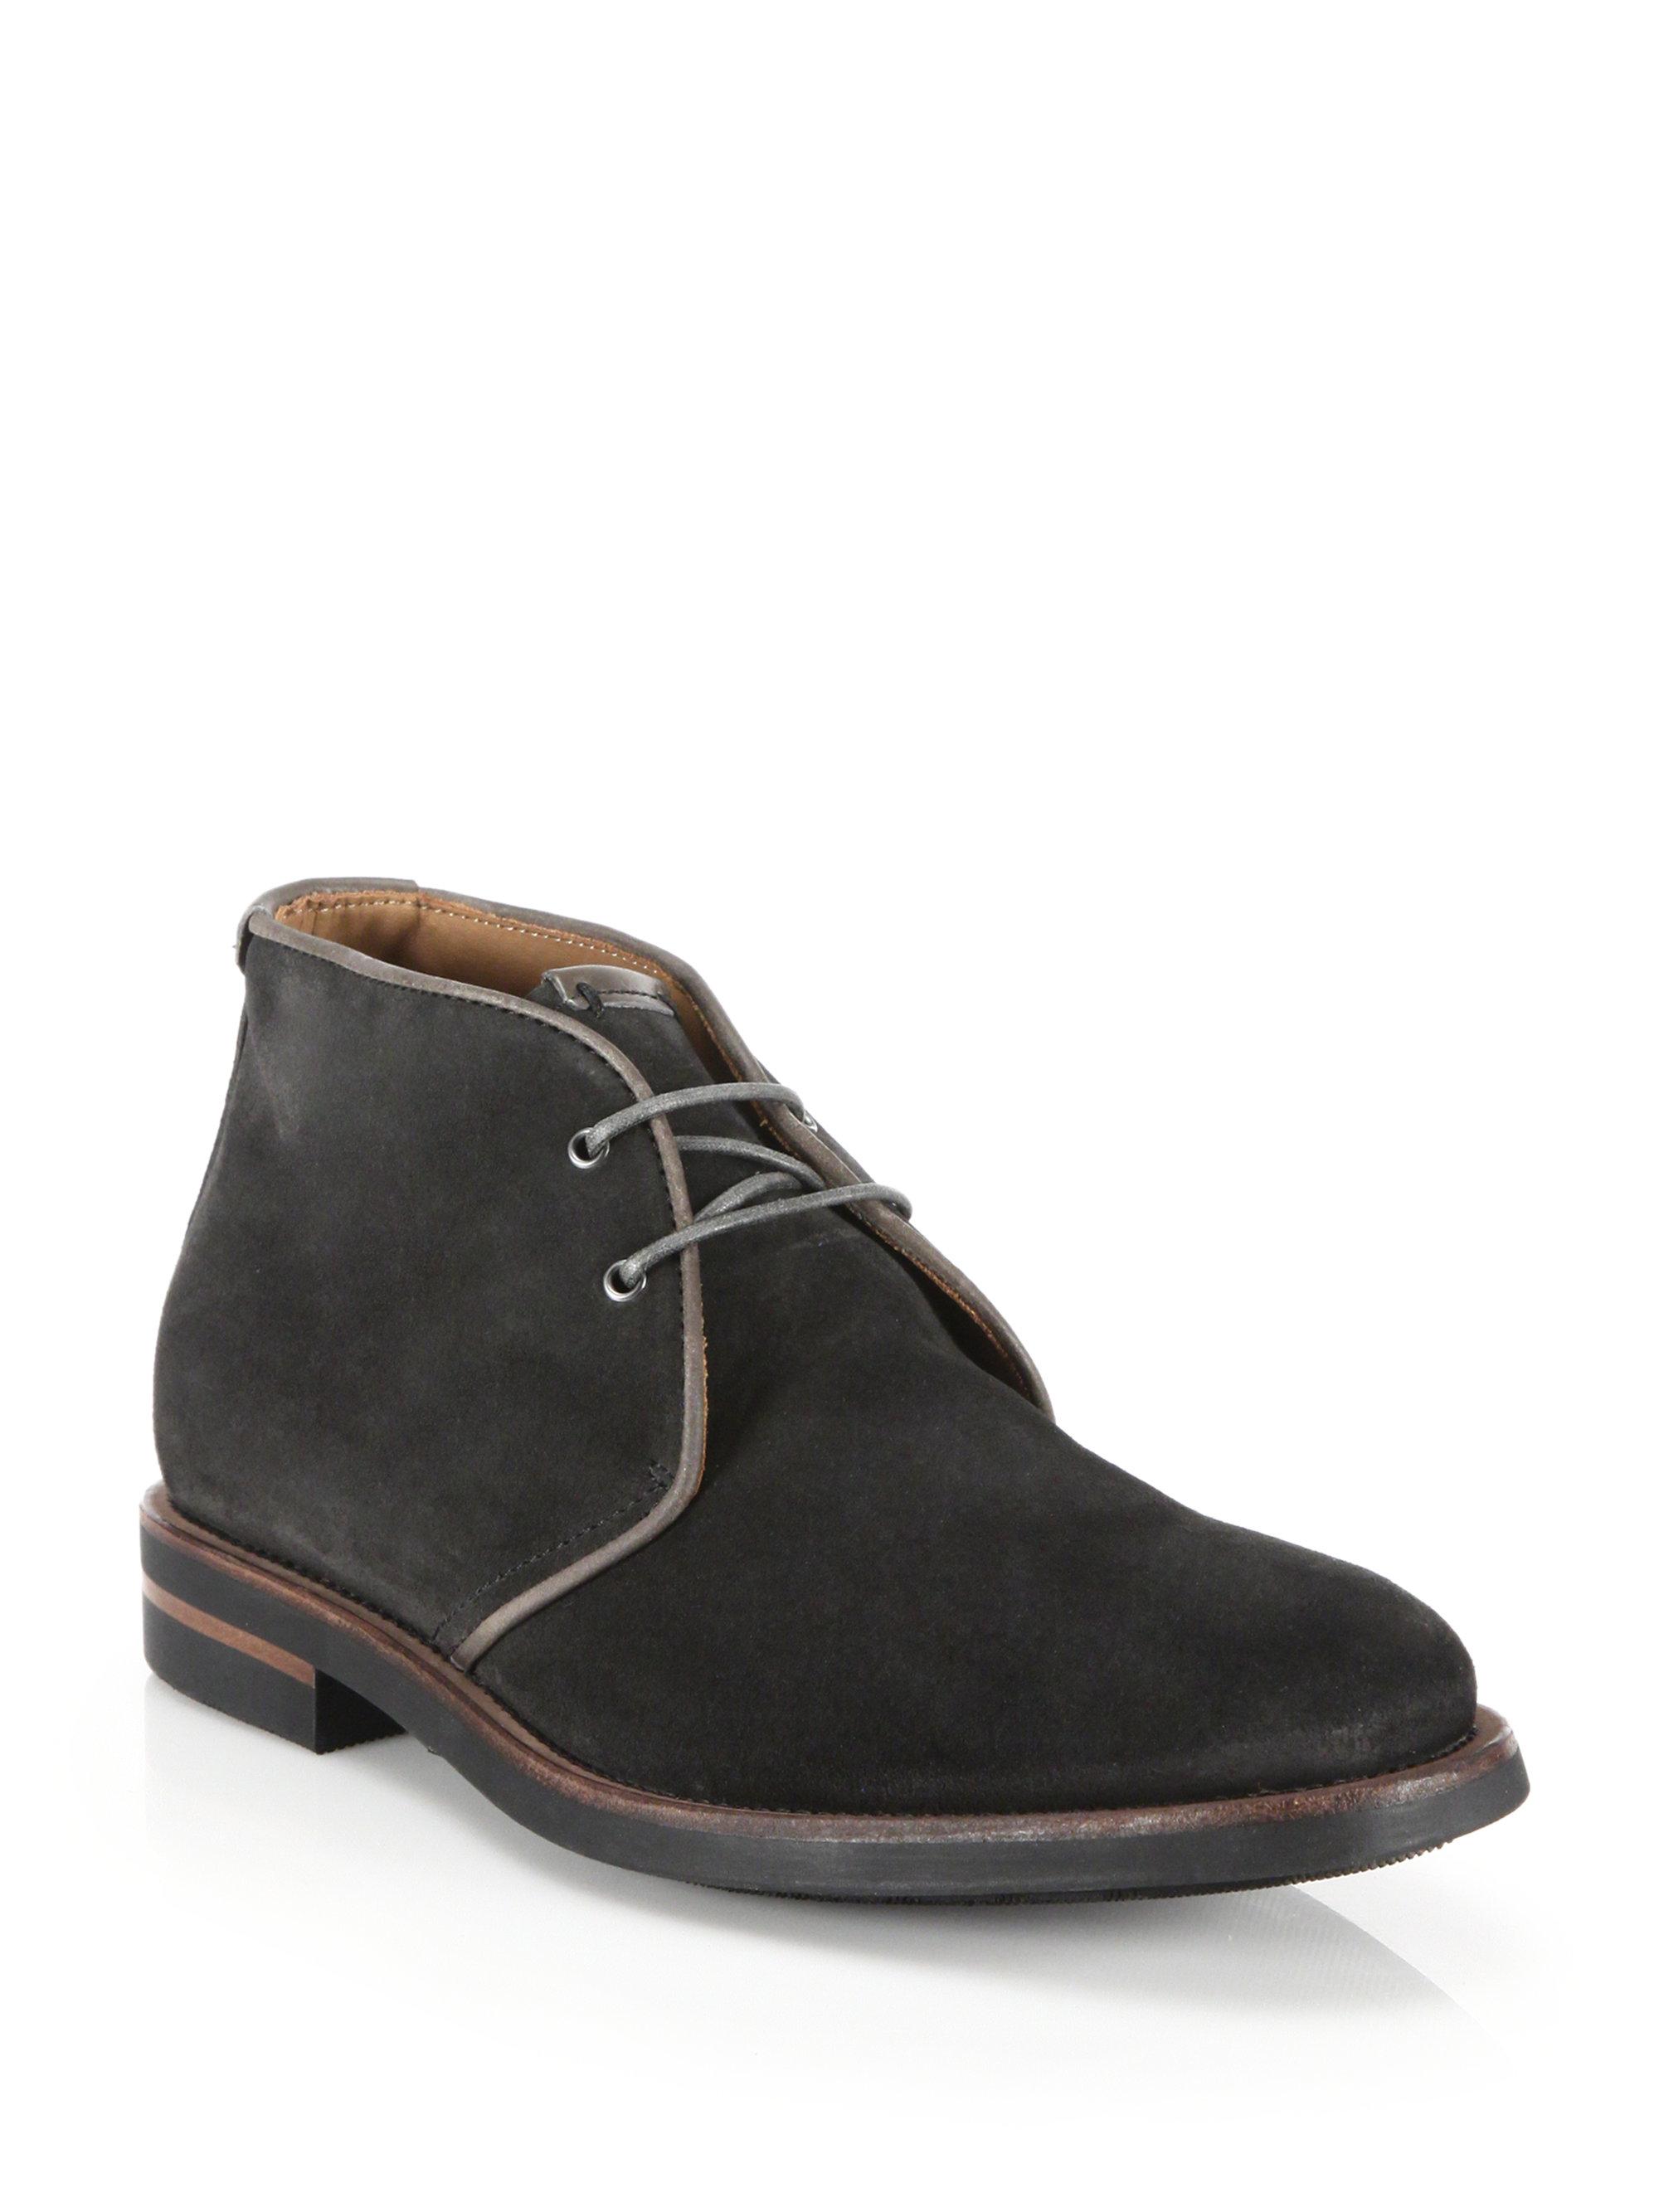 Aquatalia Men S Shoes Sale